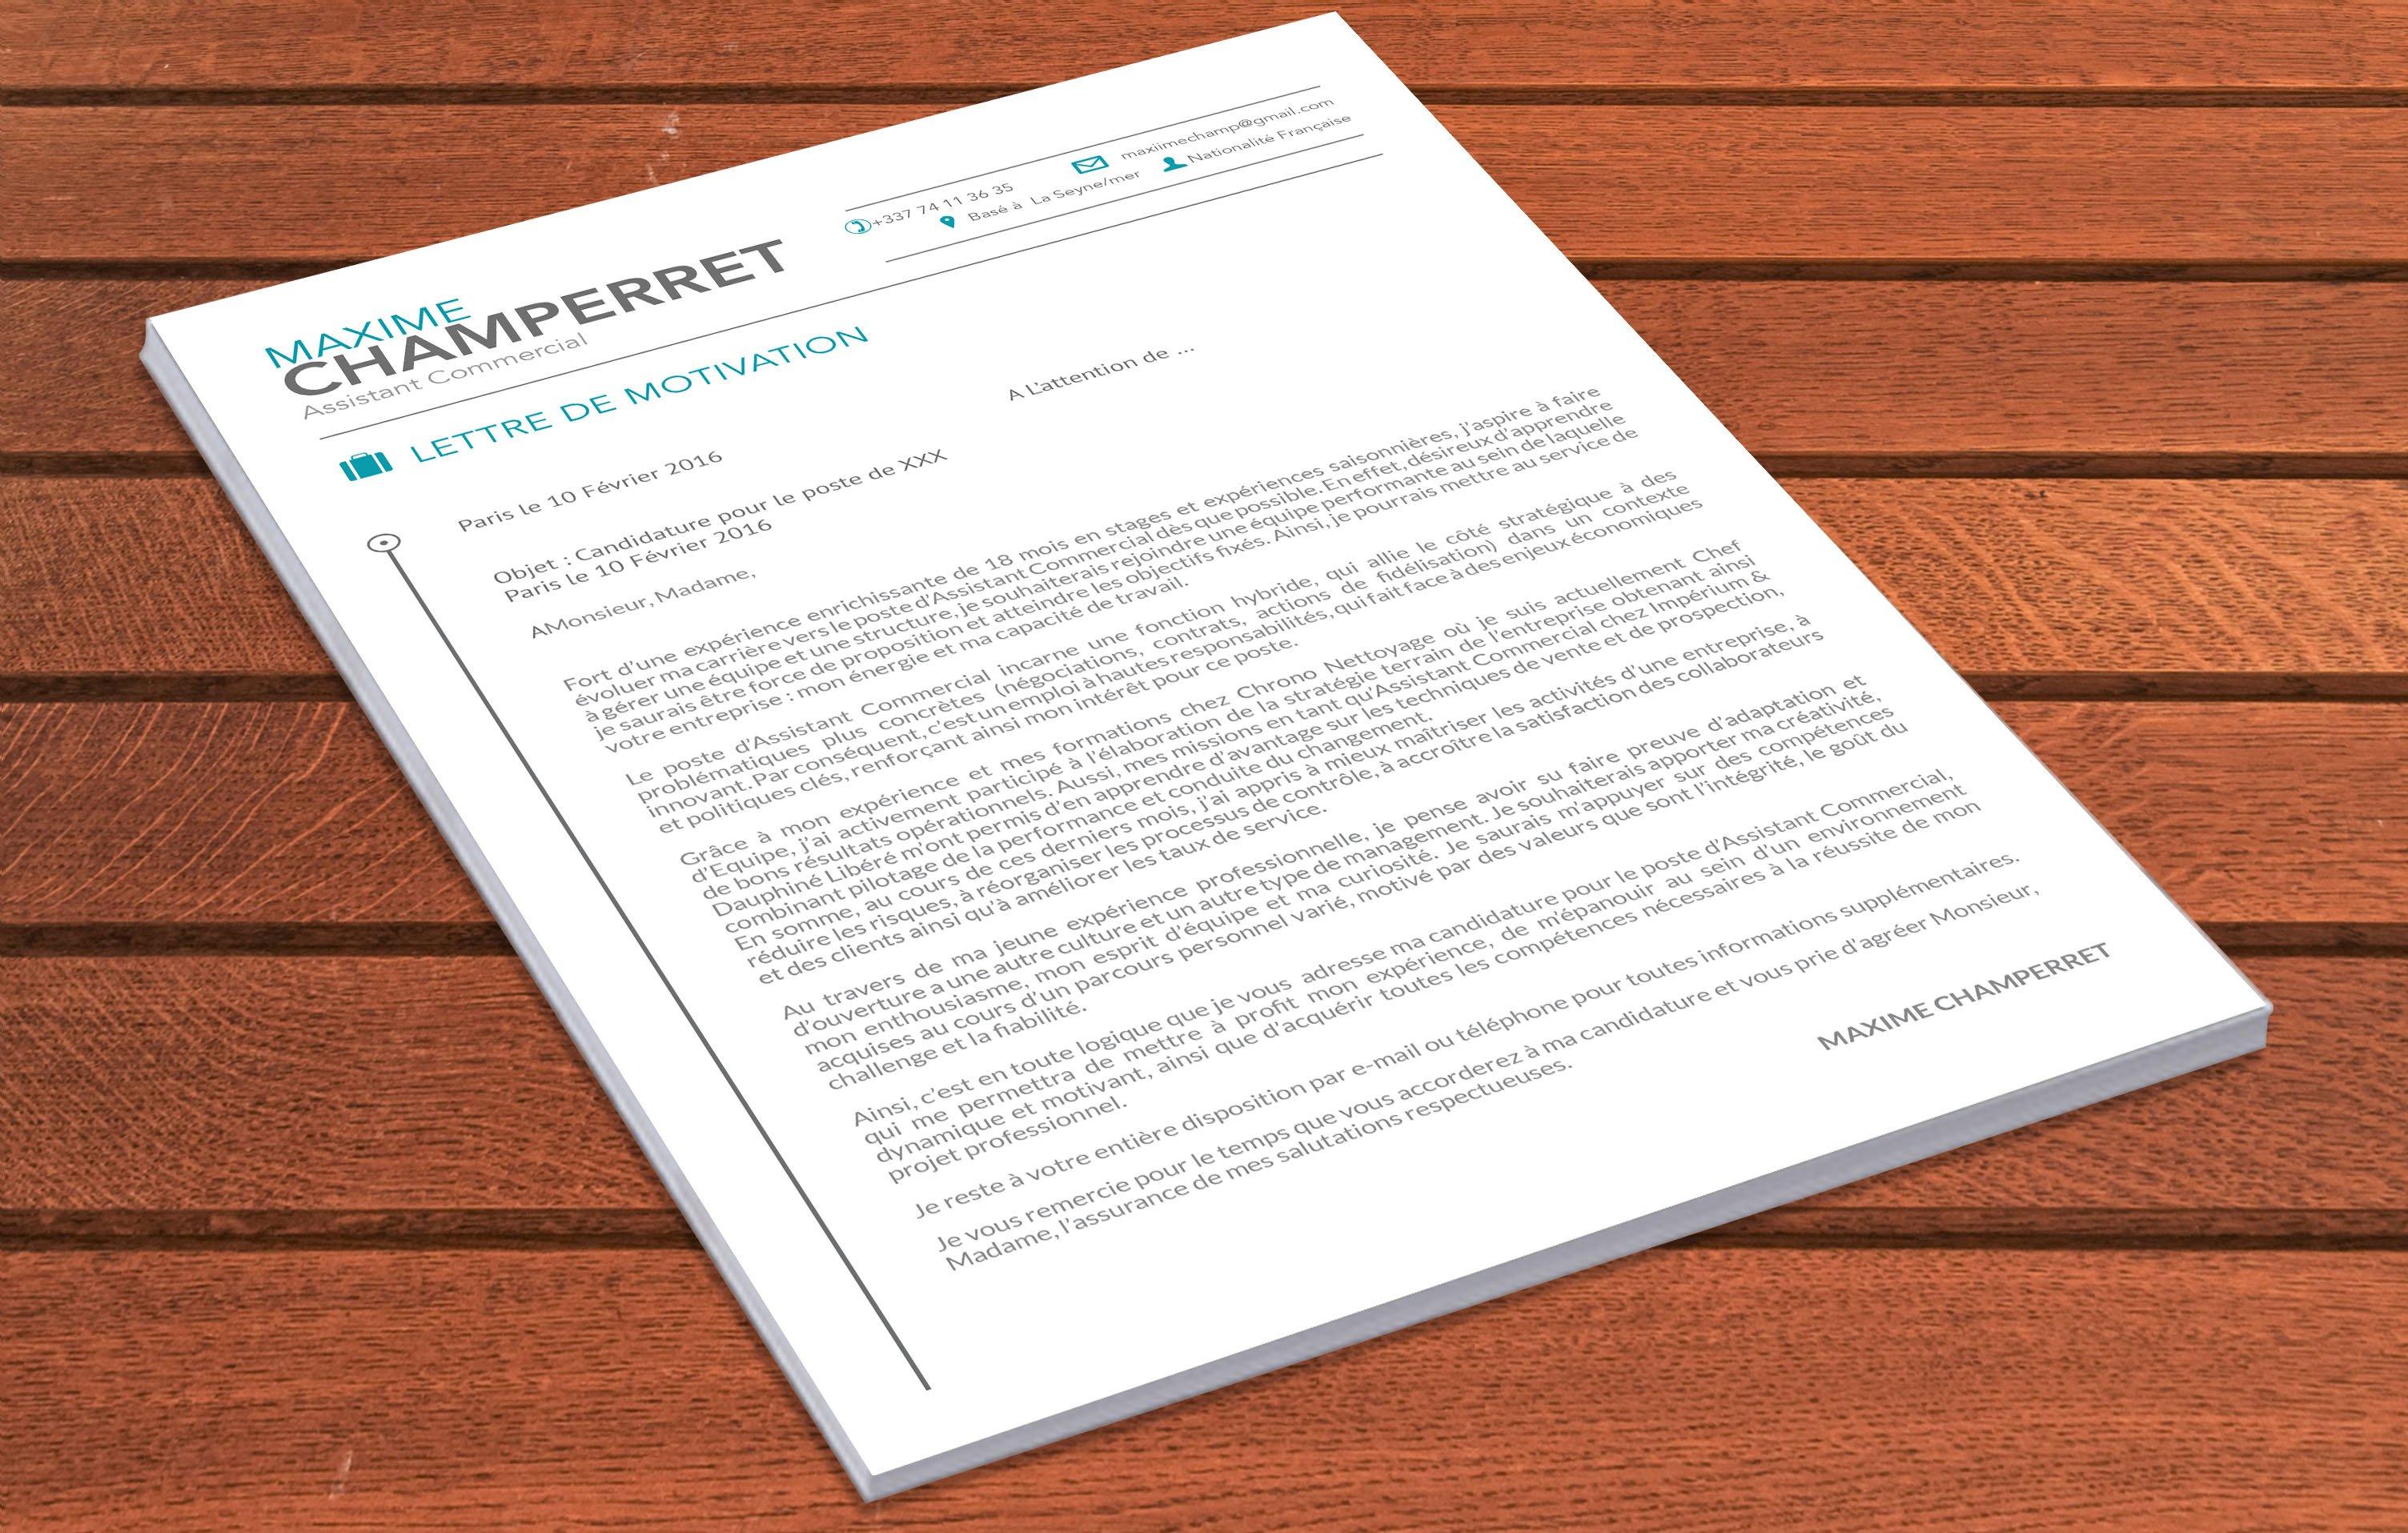 mycvfactory-cover-letter-la-bleue-3_HXDBeJ6.jpg